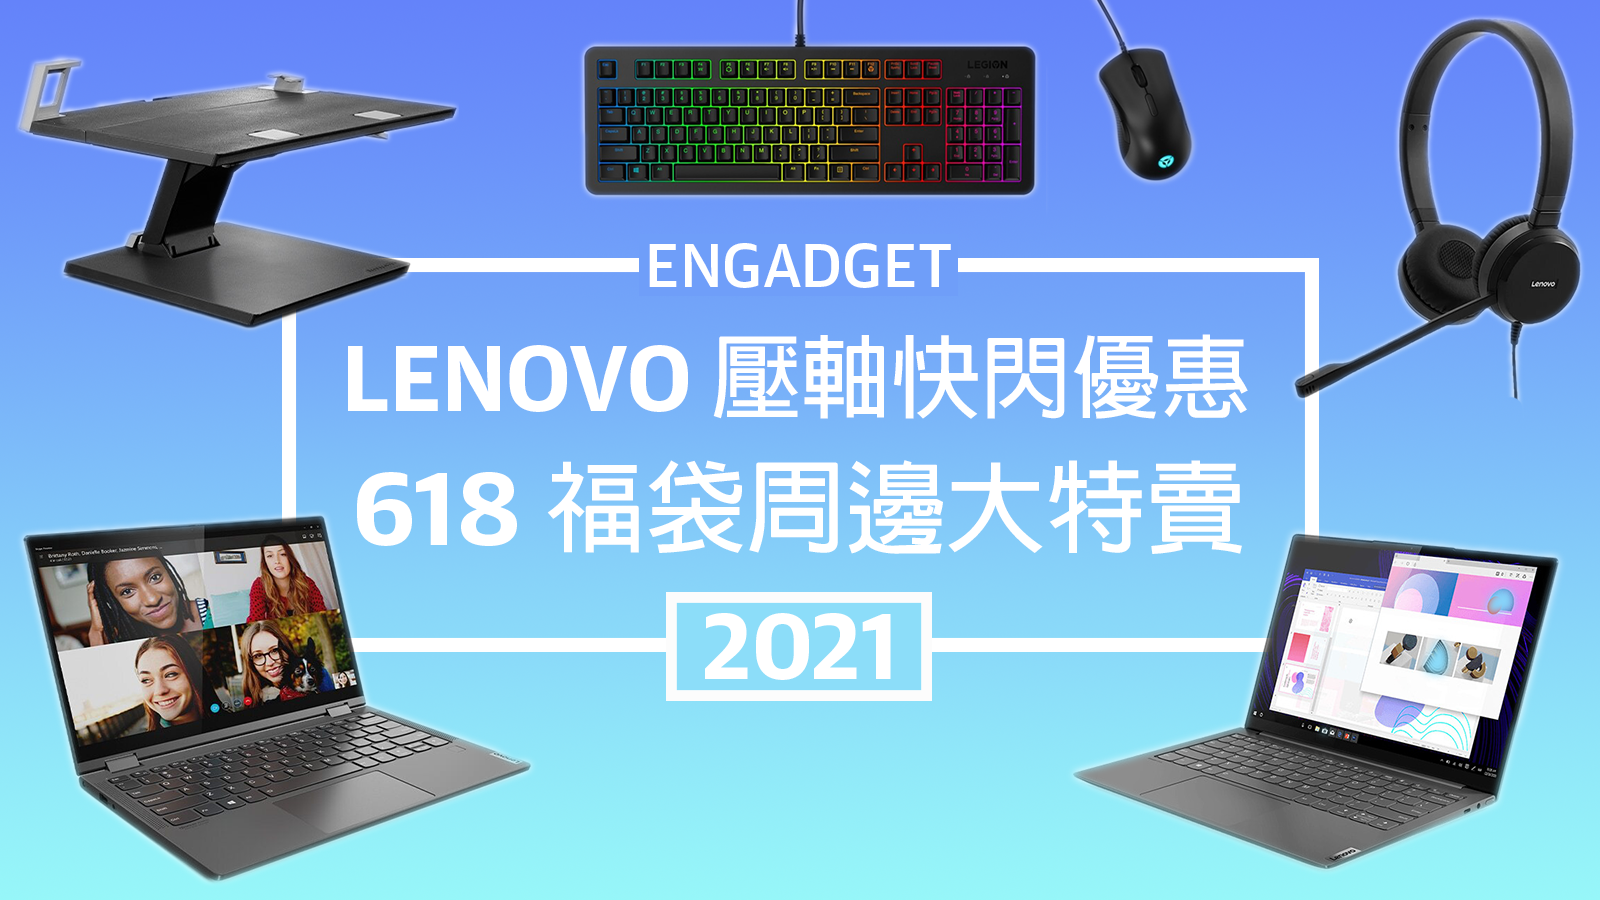 Lenovo-618-flash-sales-thumbnail